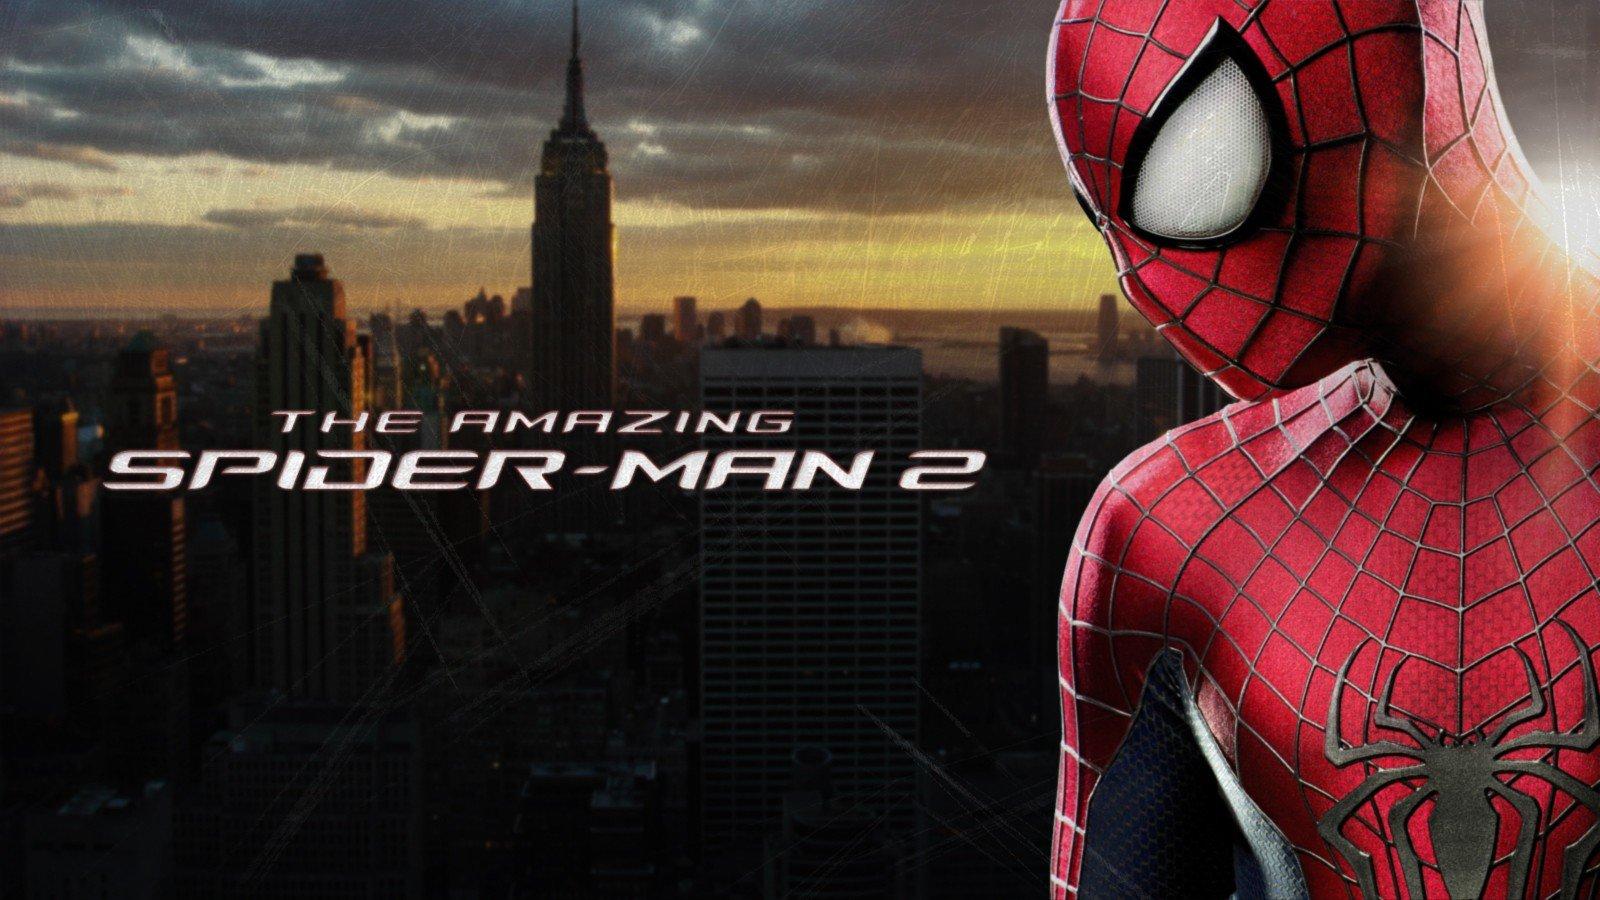 The Amazing Spider Man 2 Wallpapers 1600x900 Desktop Backgrounds